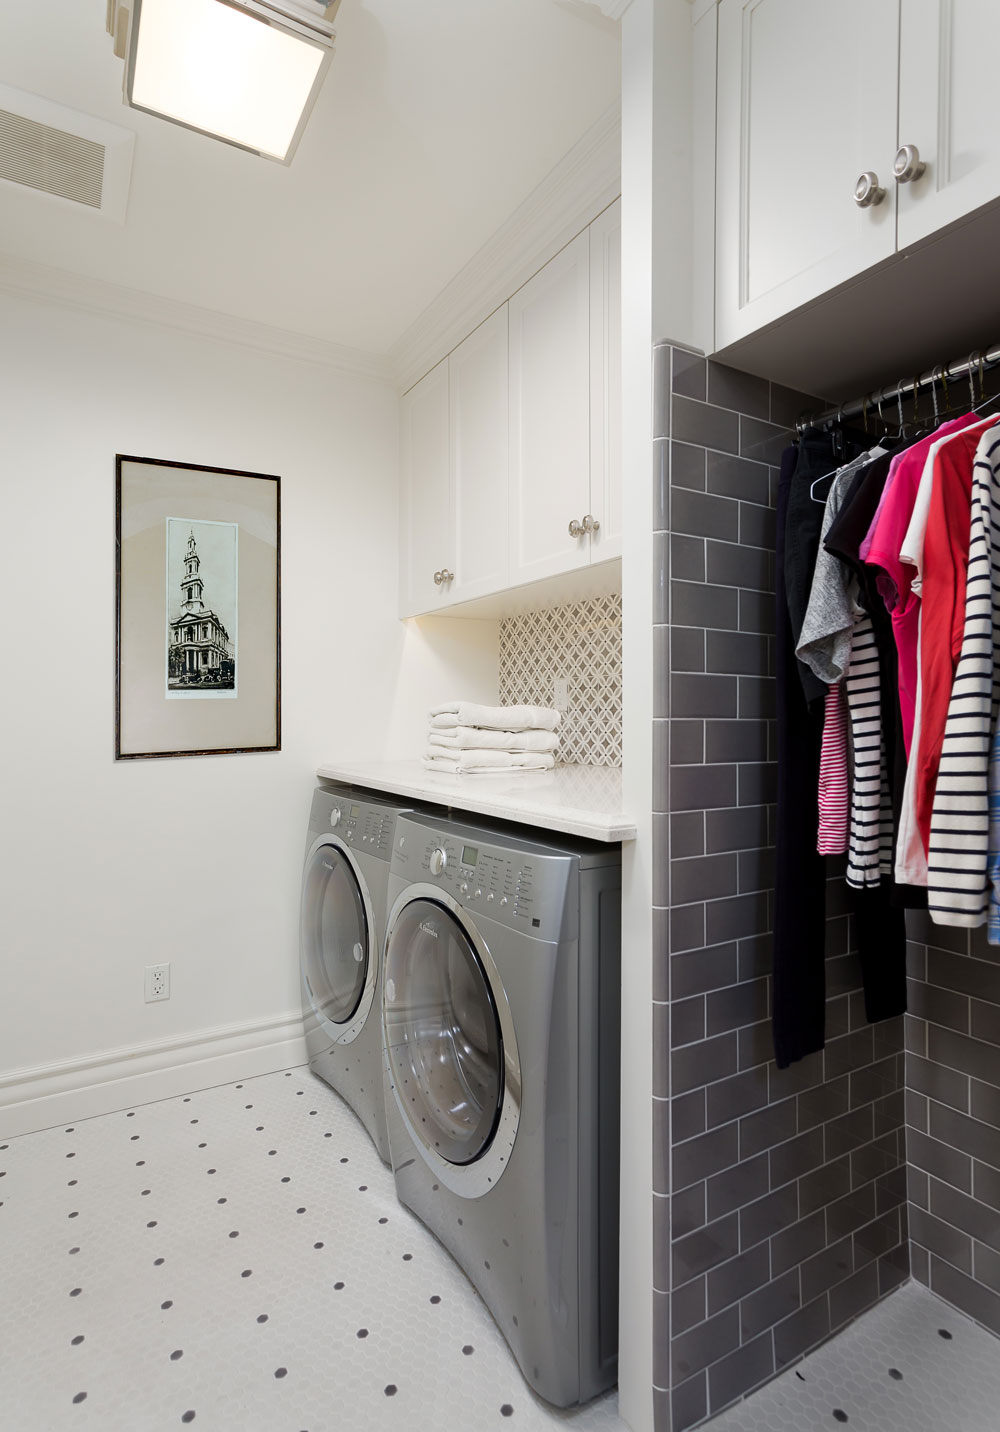 Chelsea-laundry-room-blackandwhite-grey.jpg